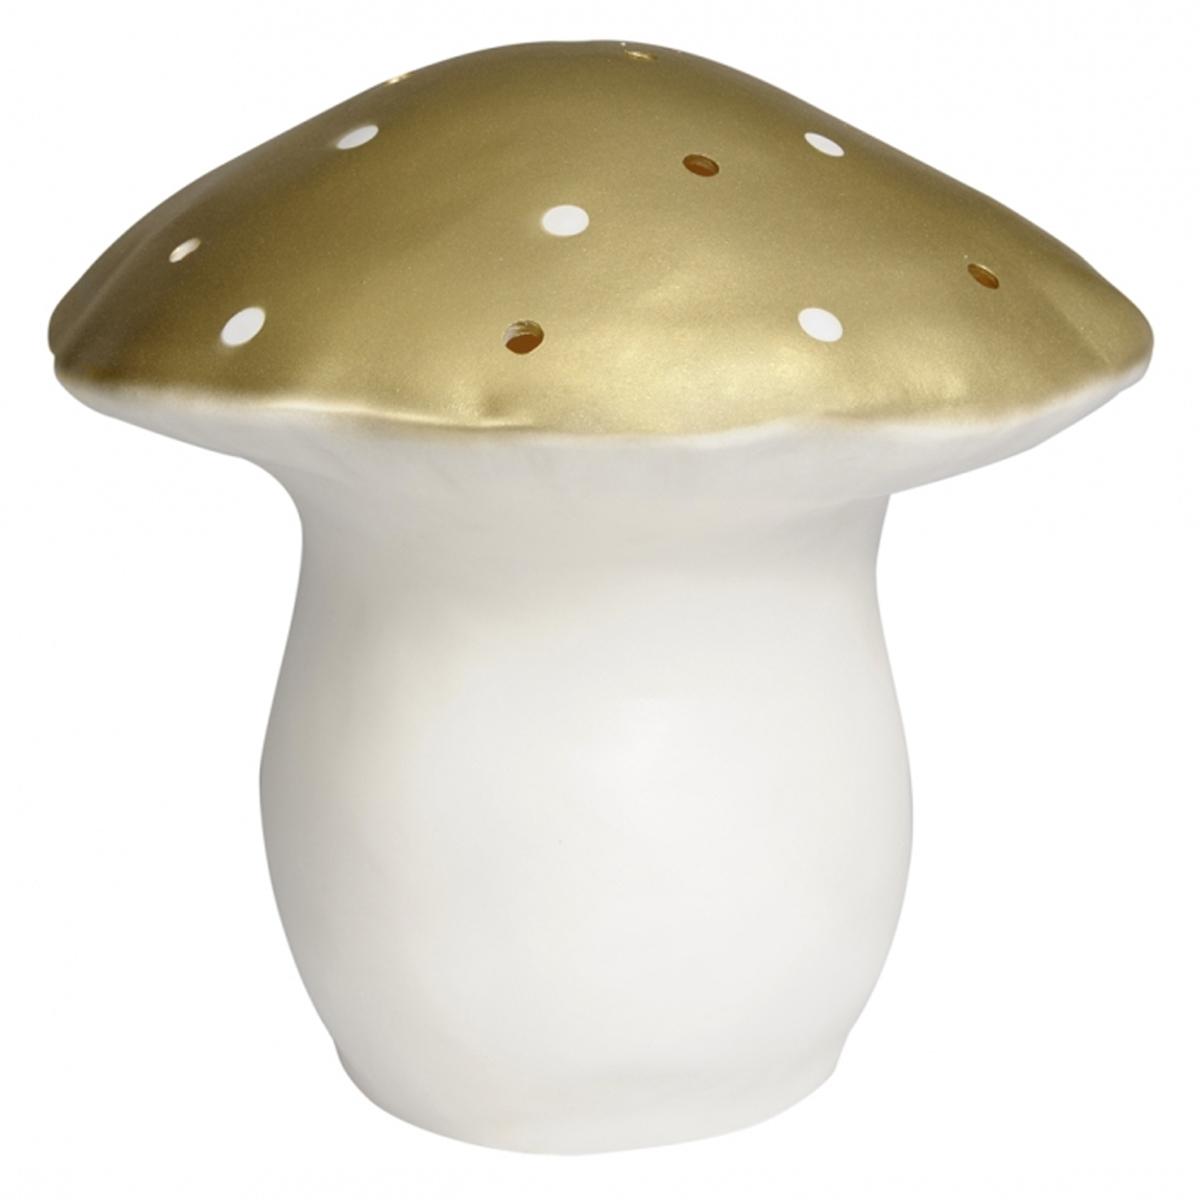 Lampe à poser Lampe Grand Champignon - Doré Lampe Grand Champignon - Doré